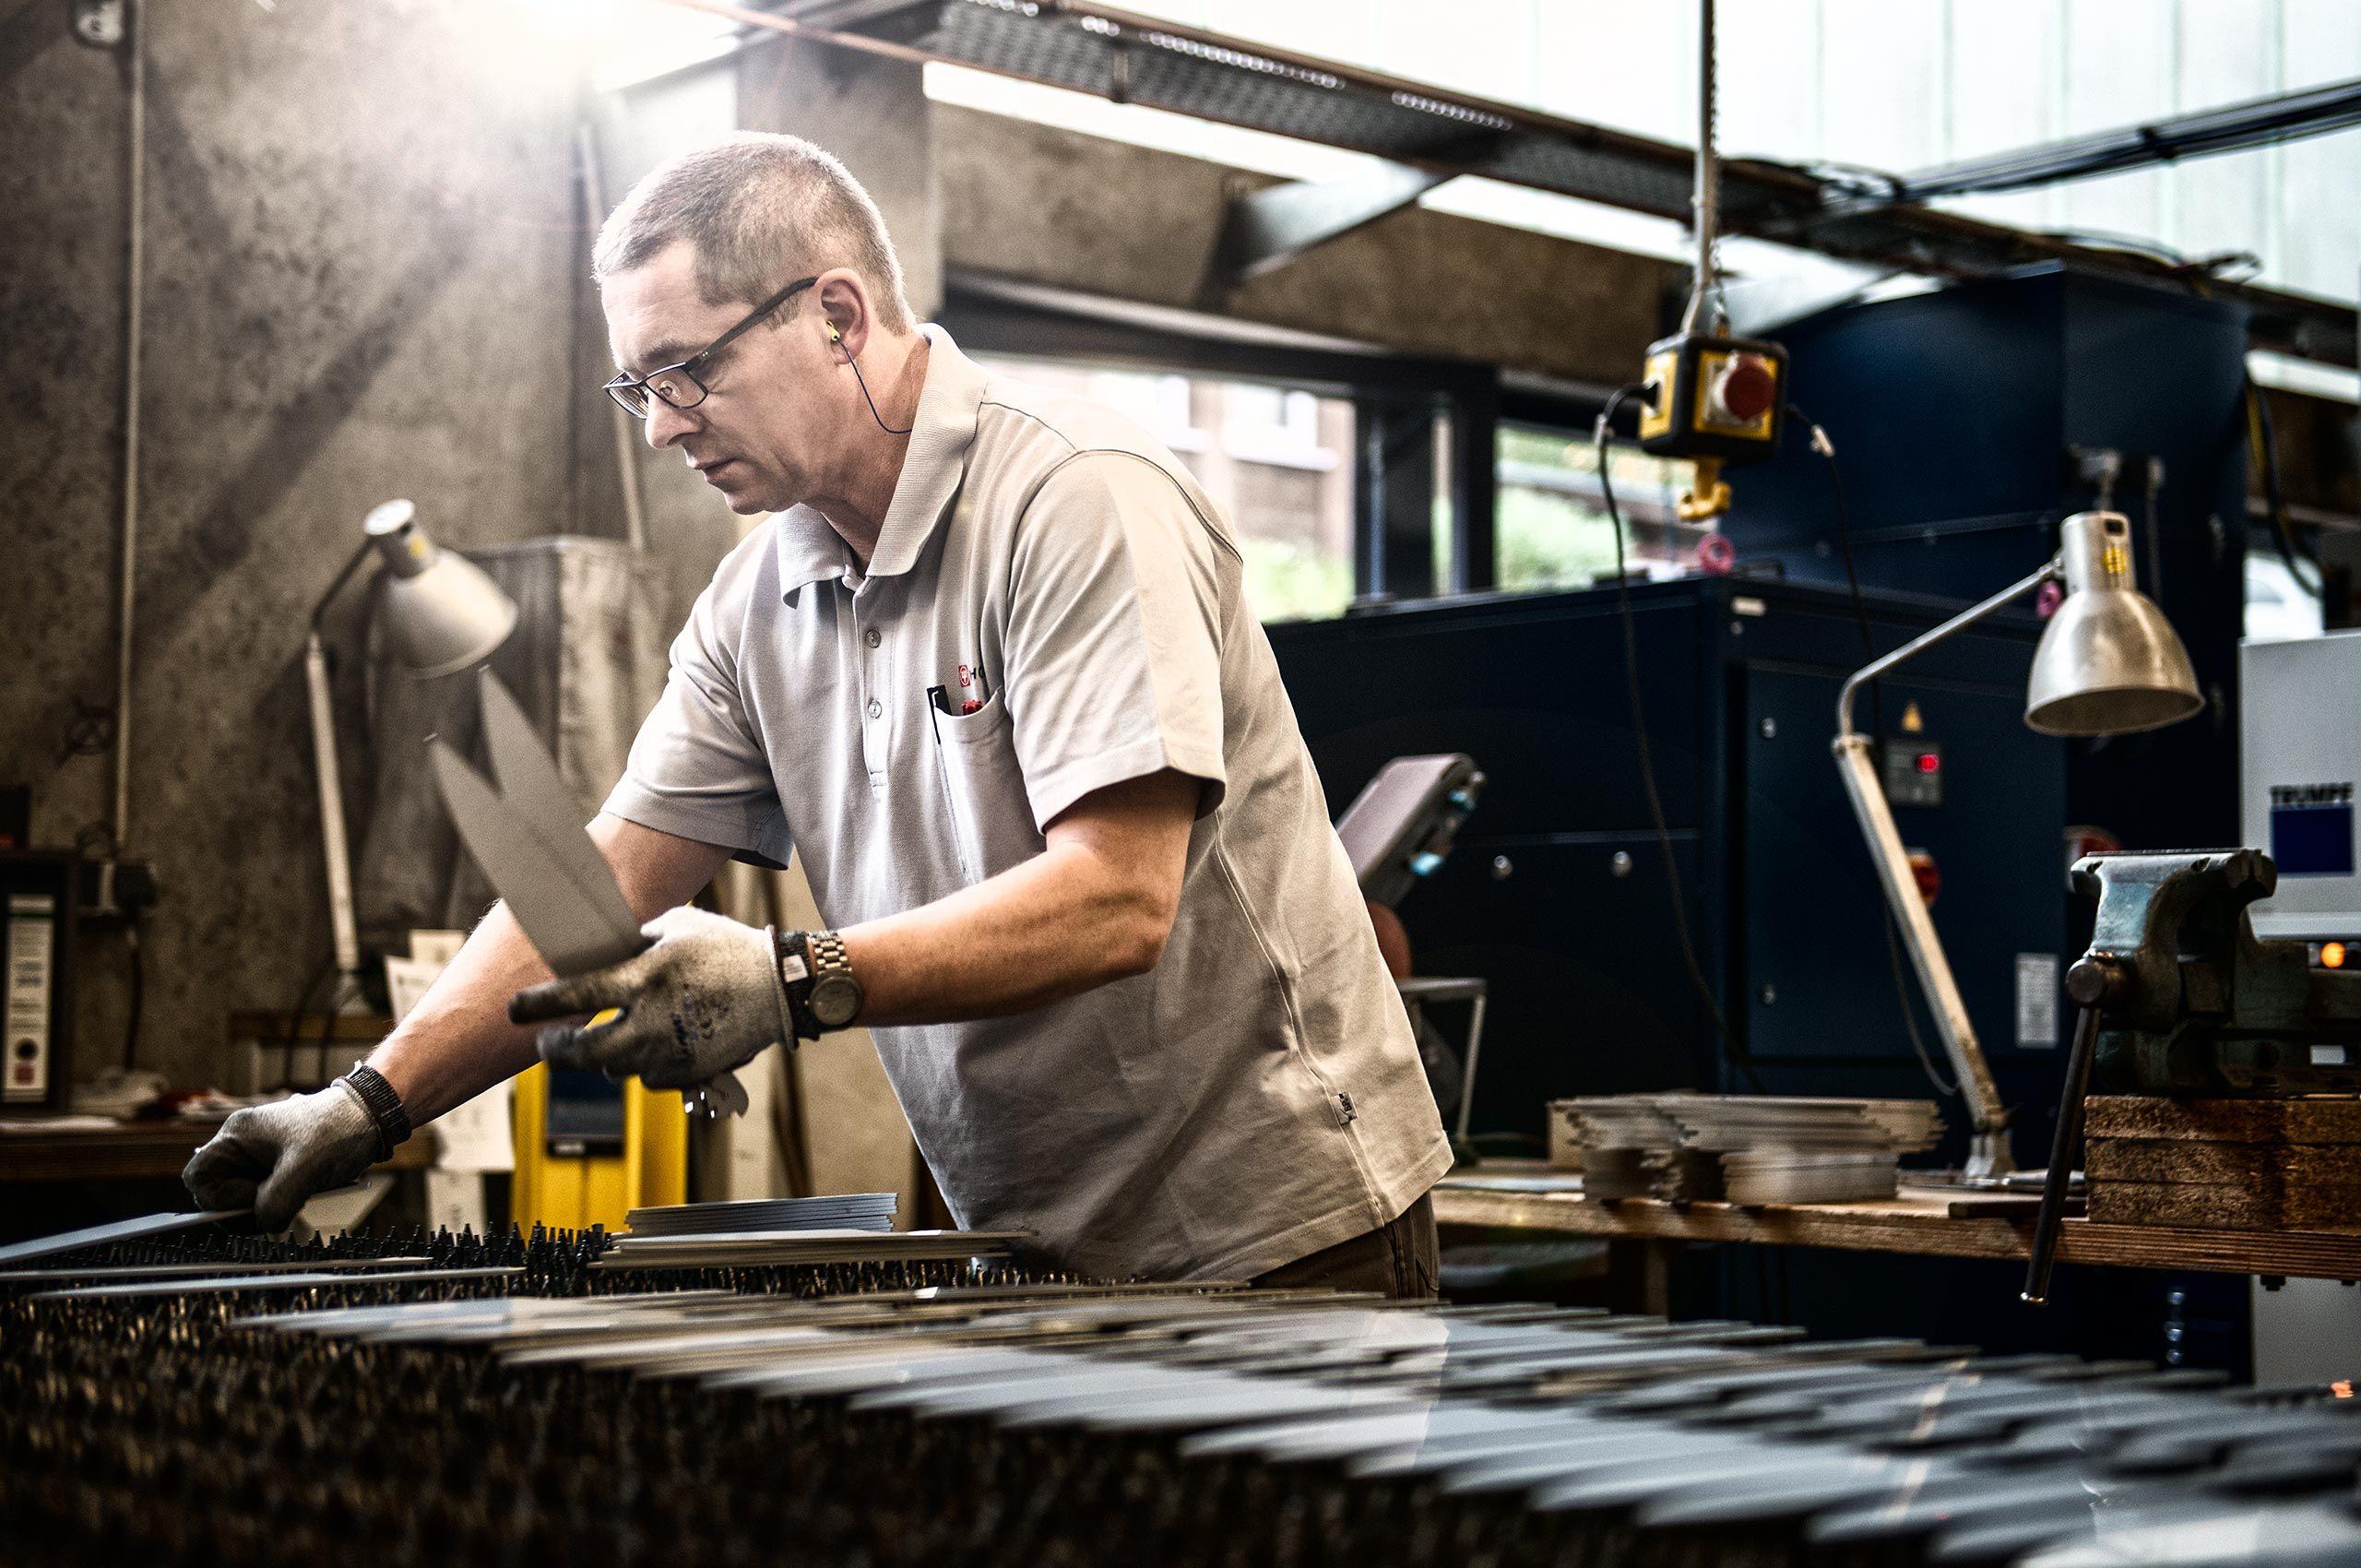 laser-cut-wusthof-factory-HenrikOlundPhotography.jpg